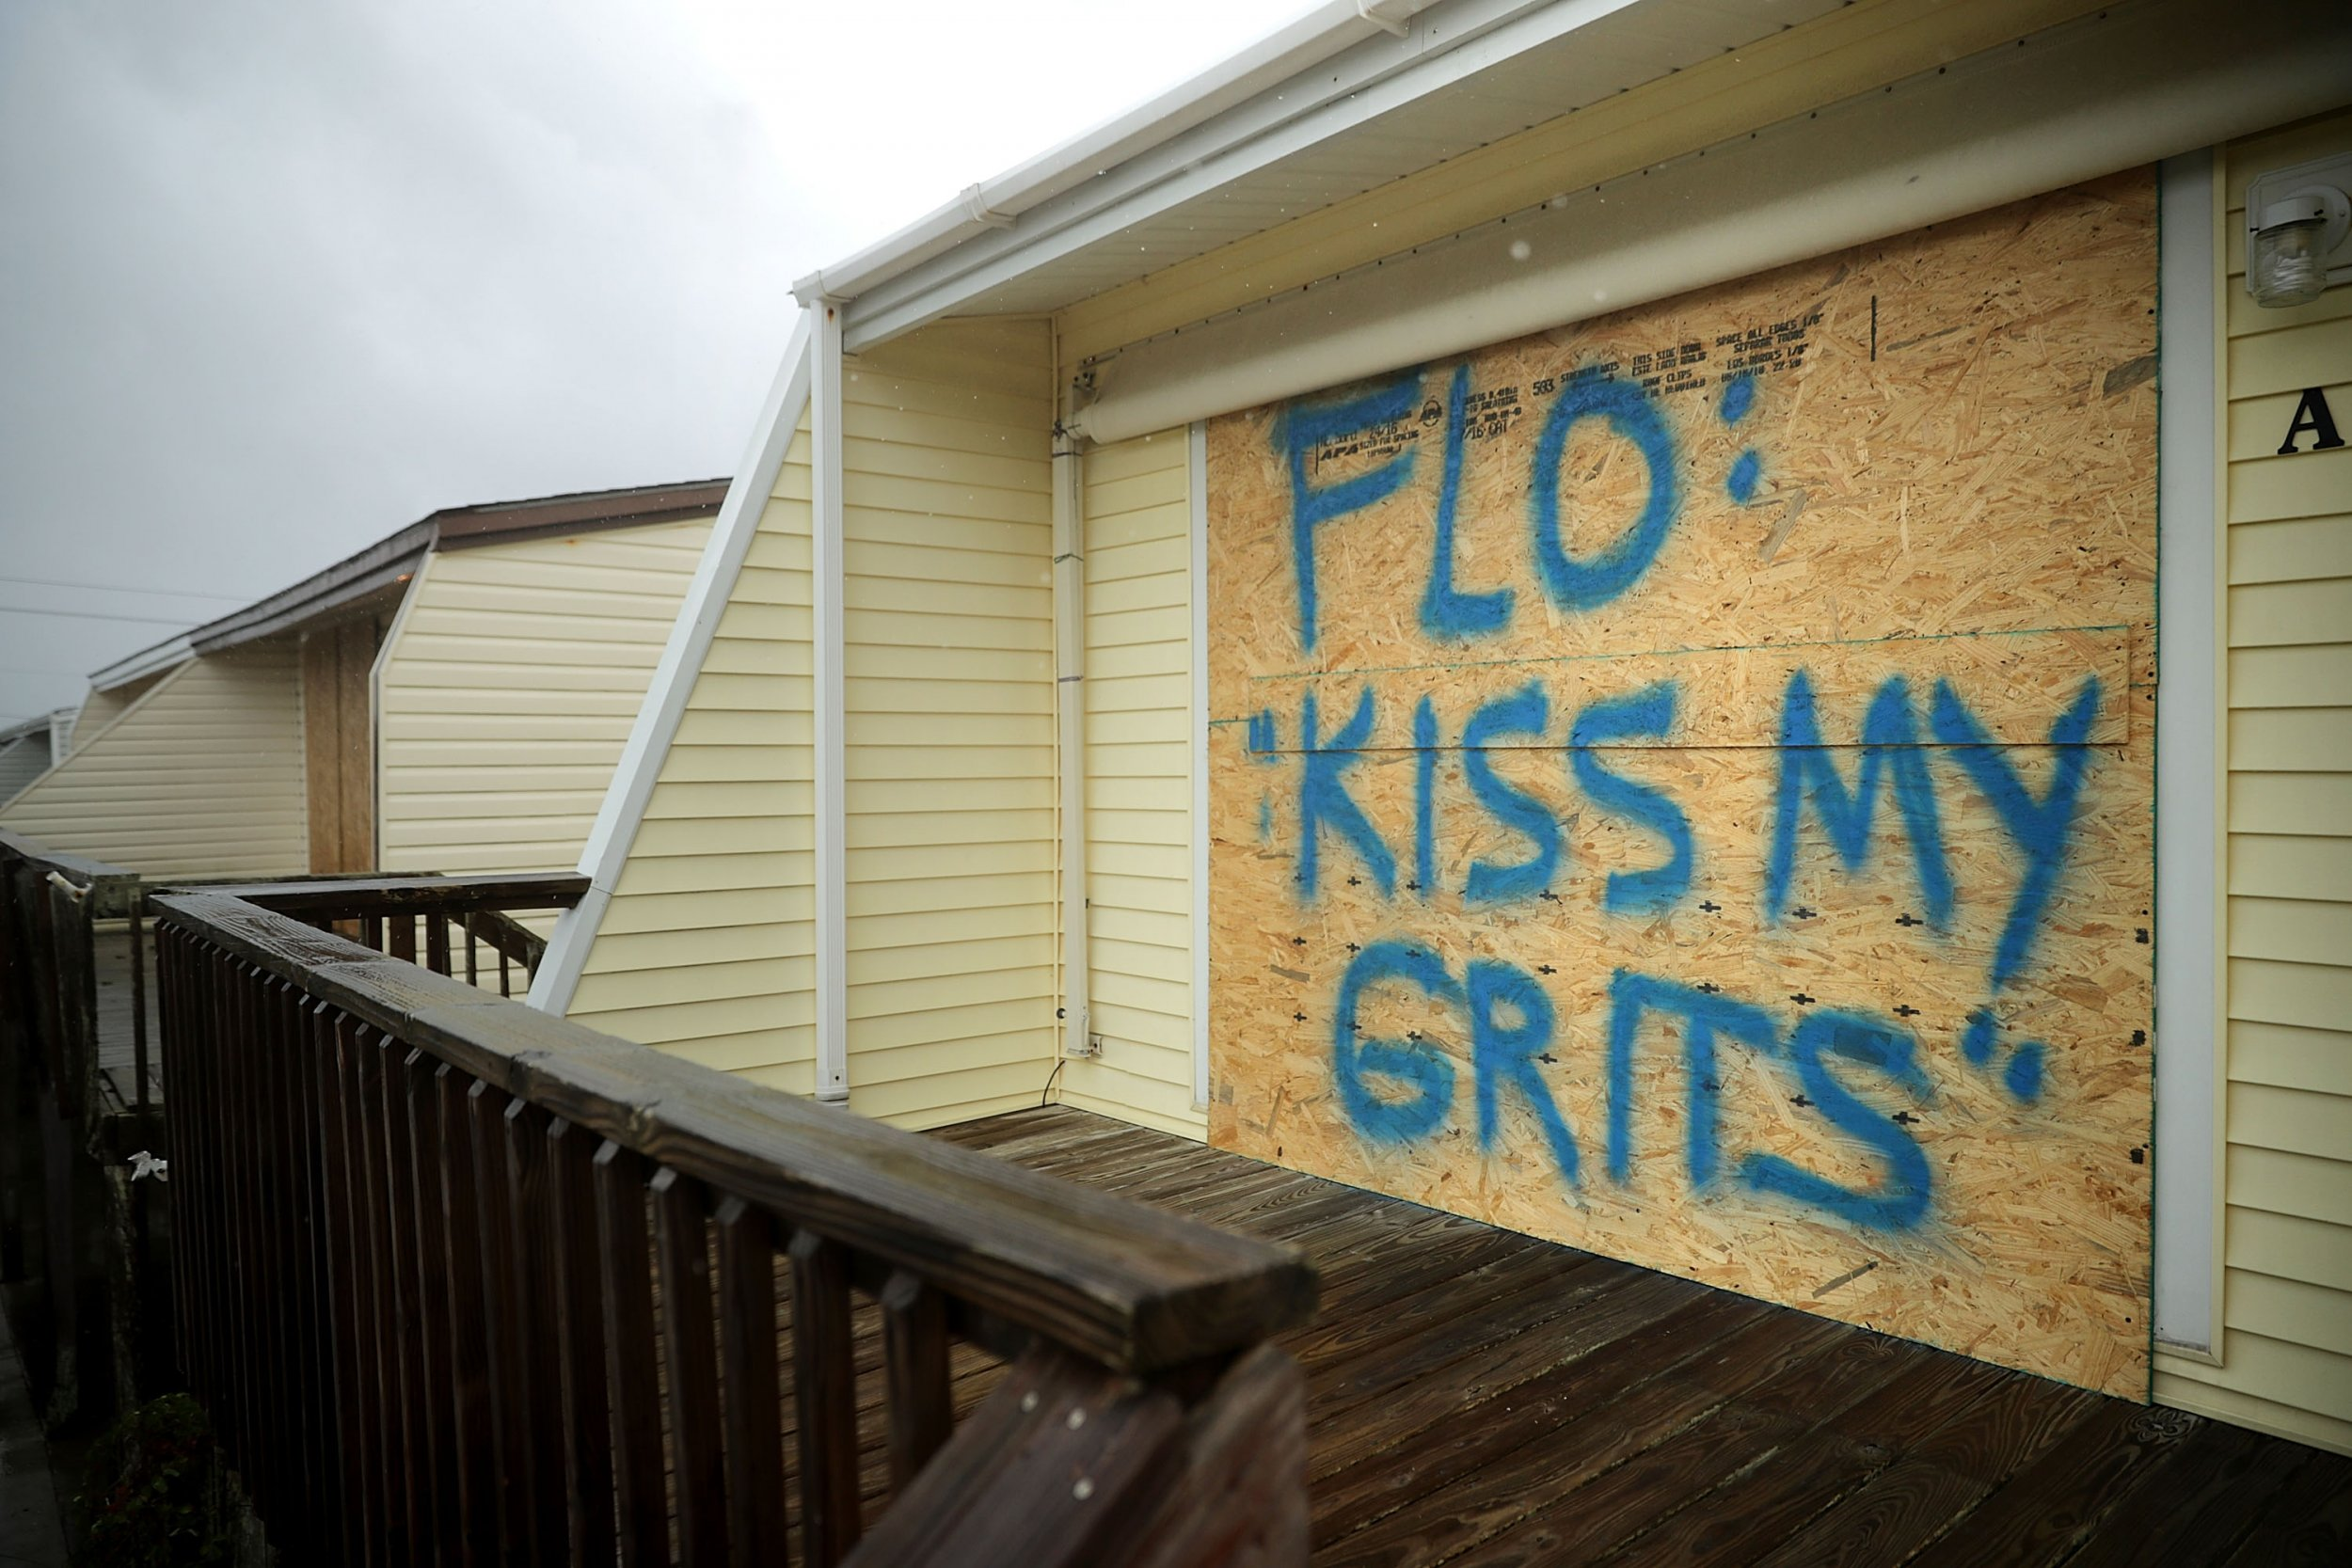 Hurricane Florence how to help, donate, volunteer